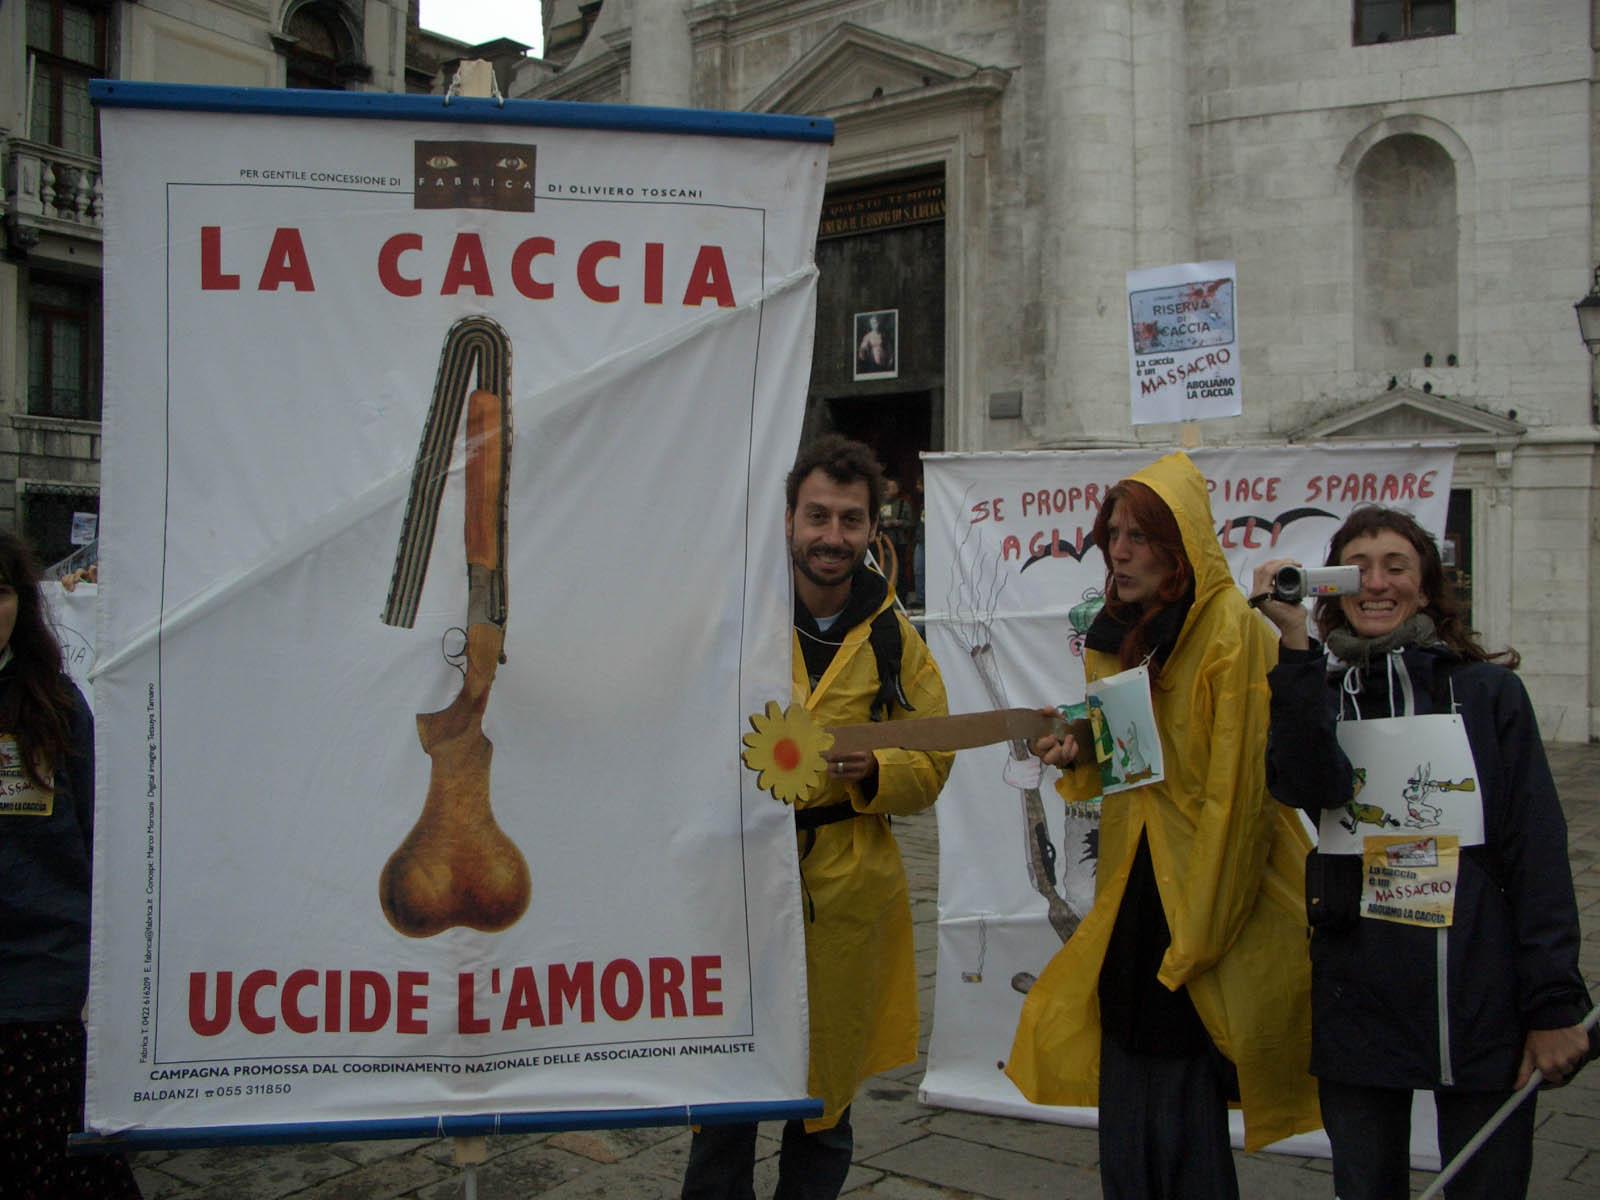 venezia-18-09-10-a